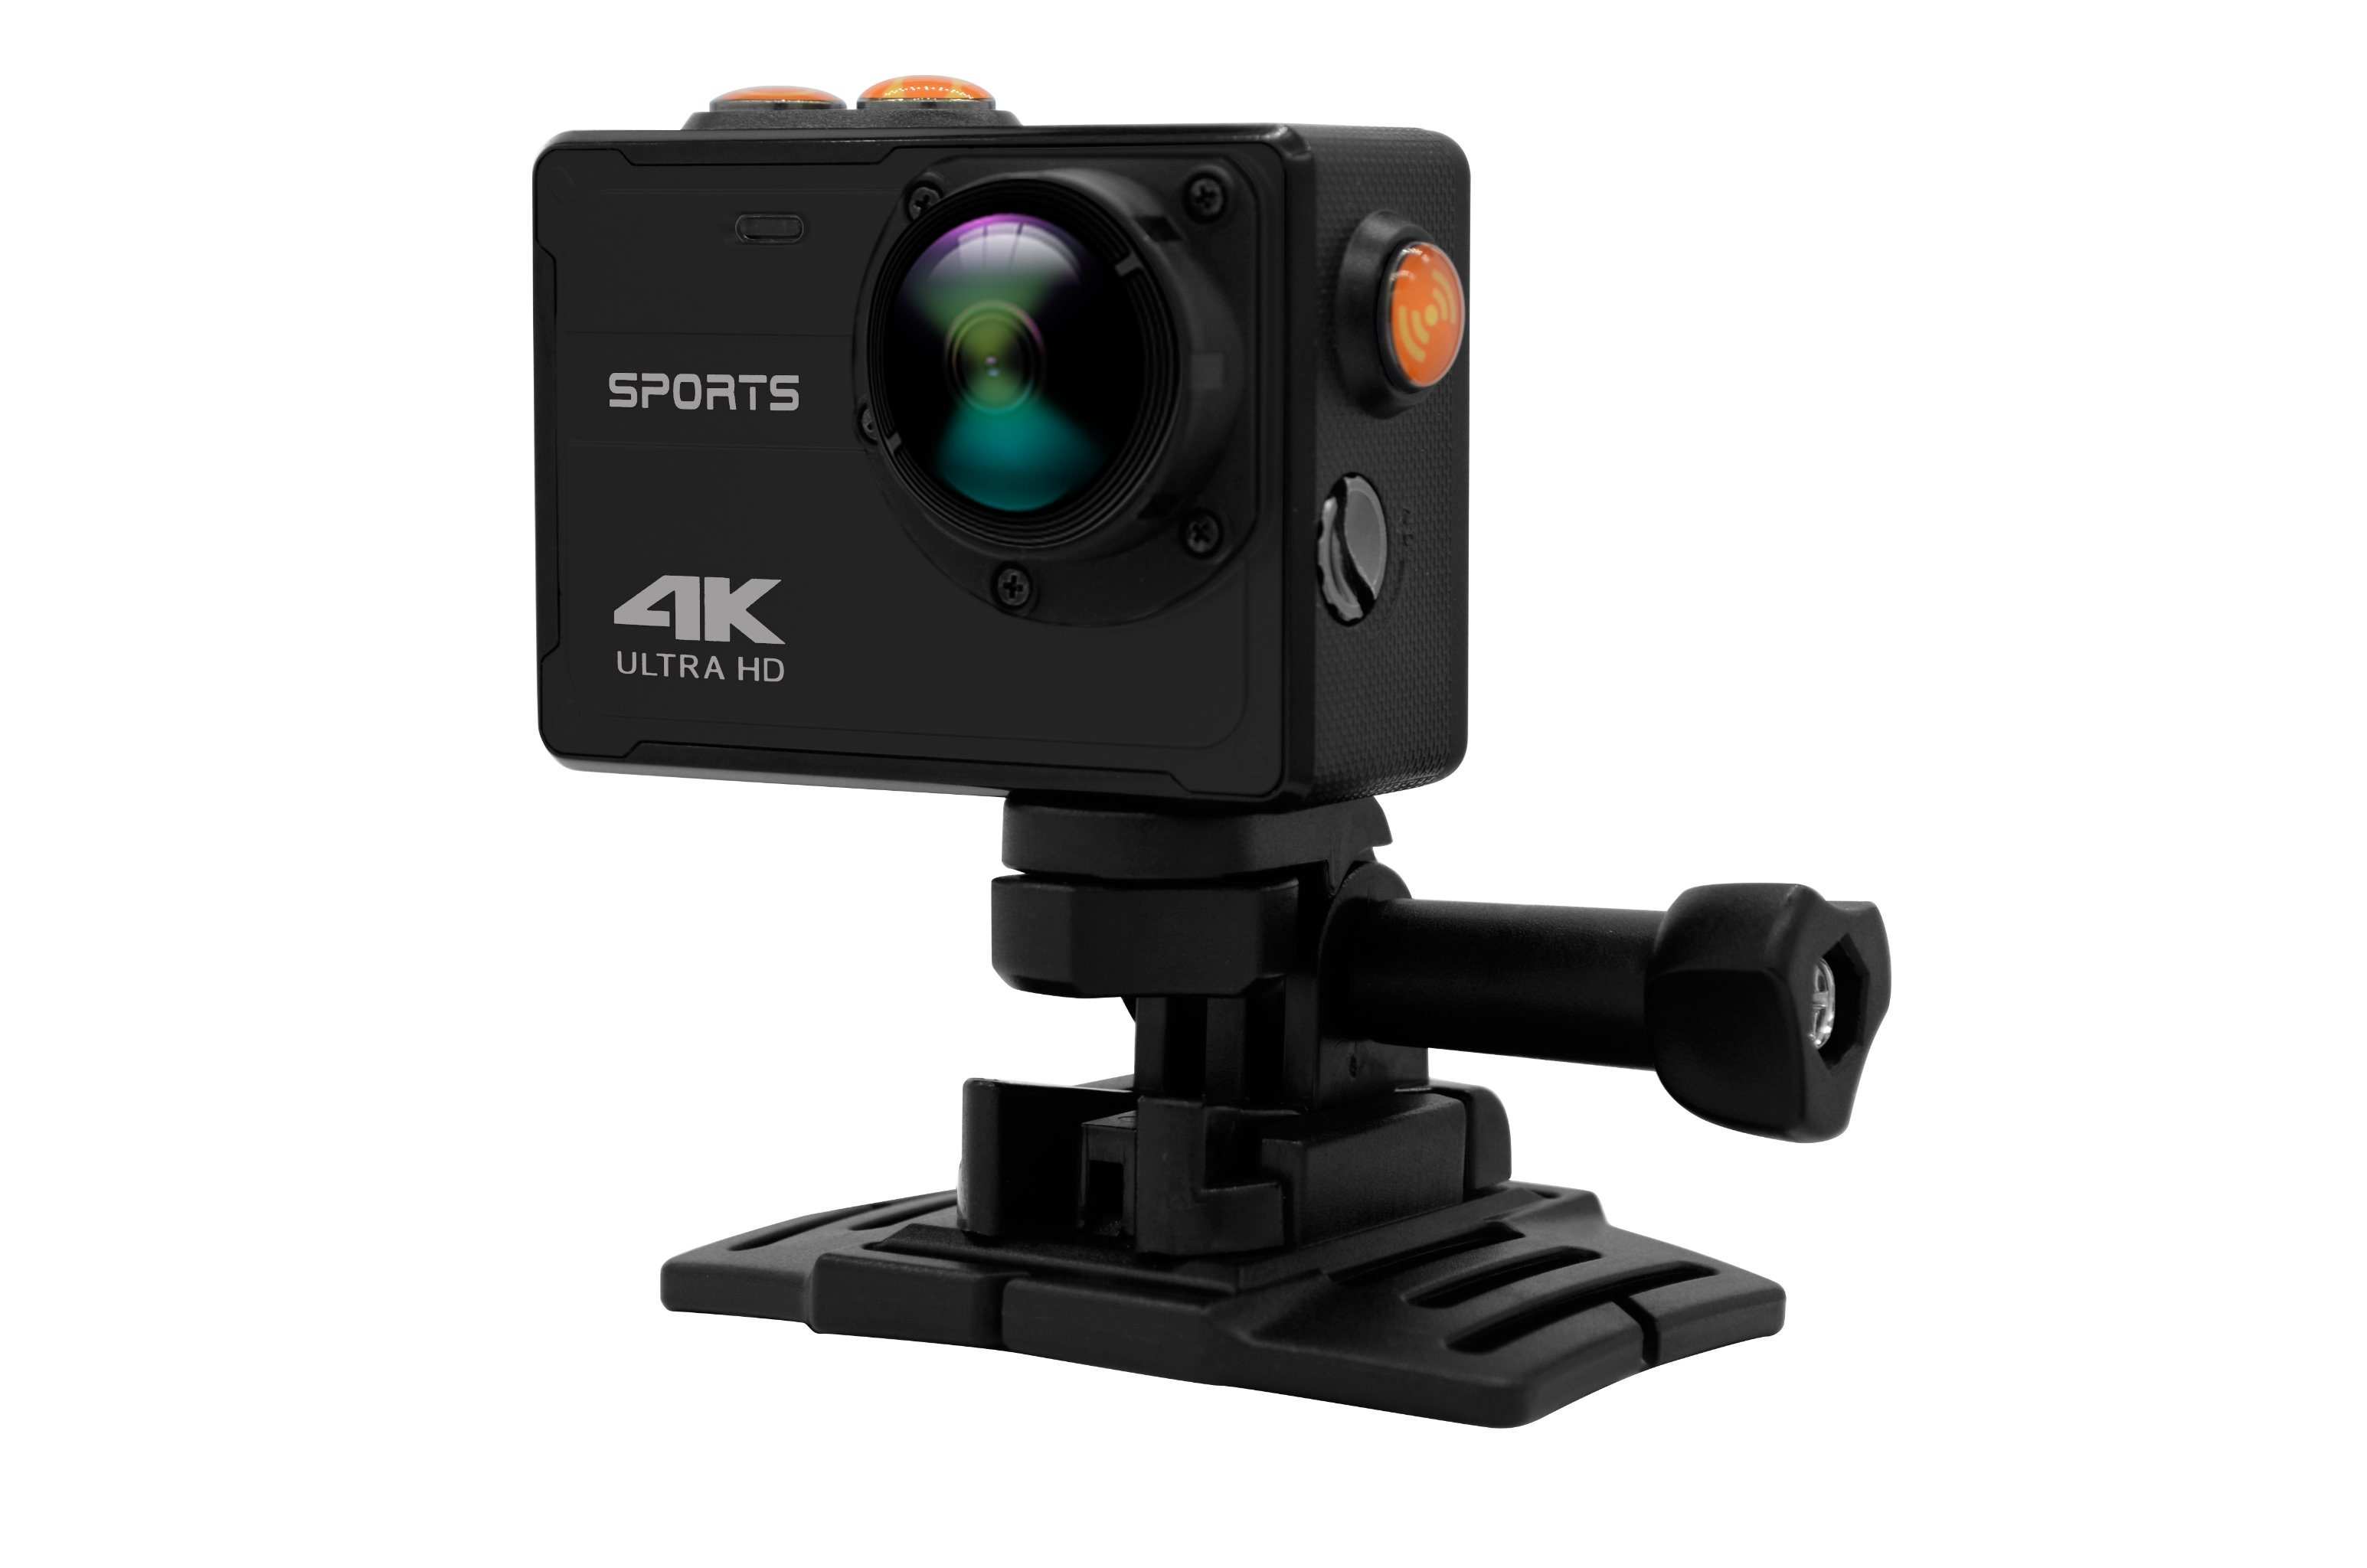 16MP 4k 5m Waterproof WiFi Sports Action Camera